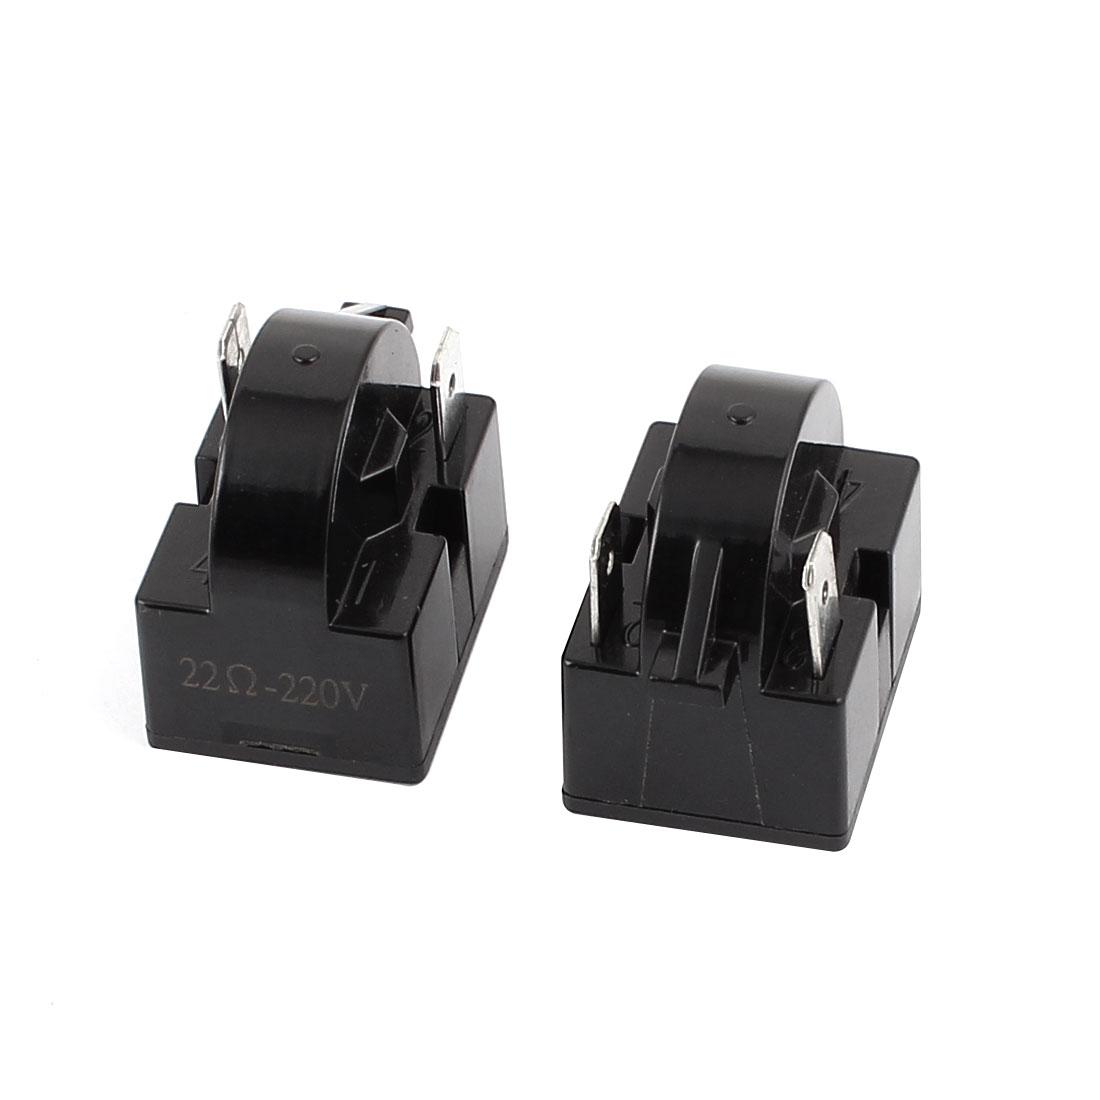 2Pcs 220V Plastic Shell 22 Ohm 2 Terminals Refrigerator PTC Starter Relay Black